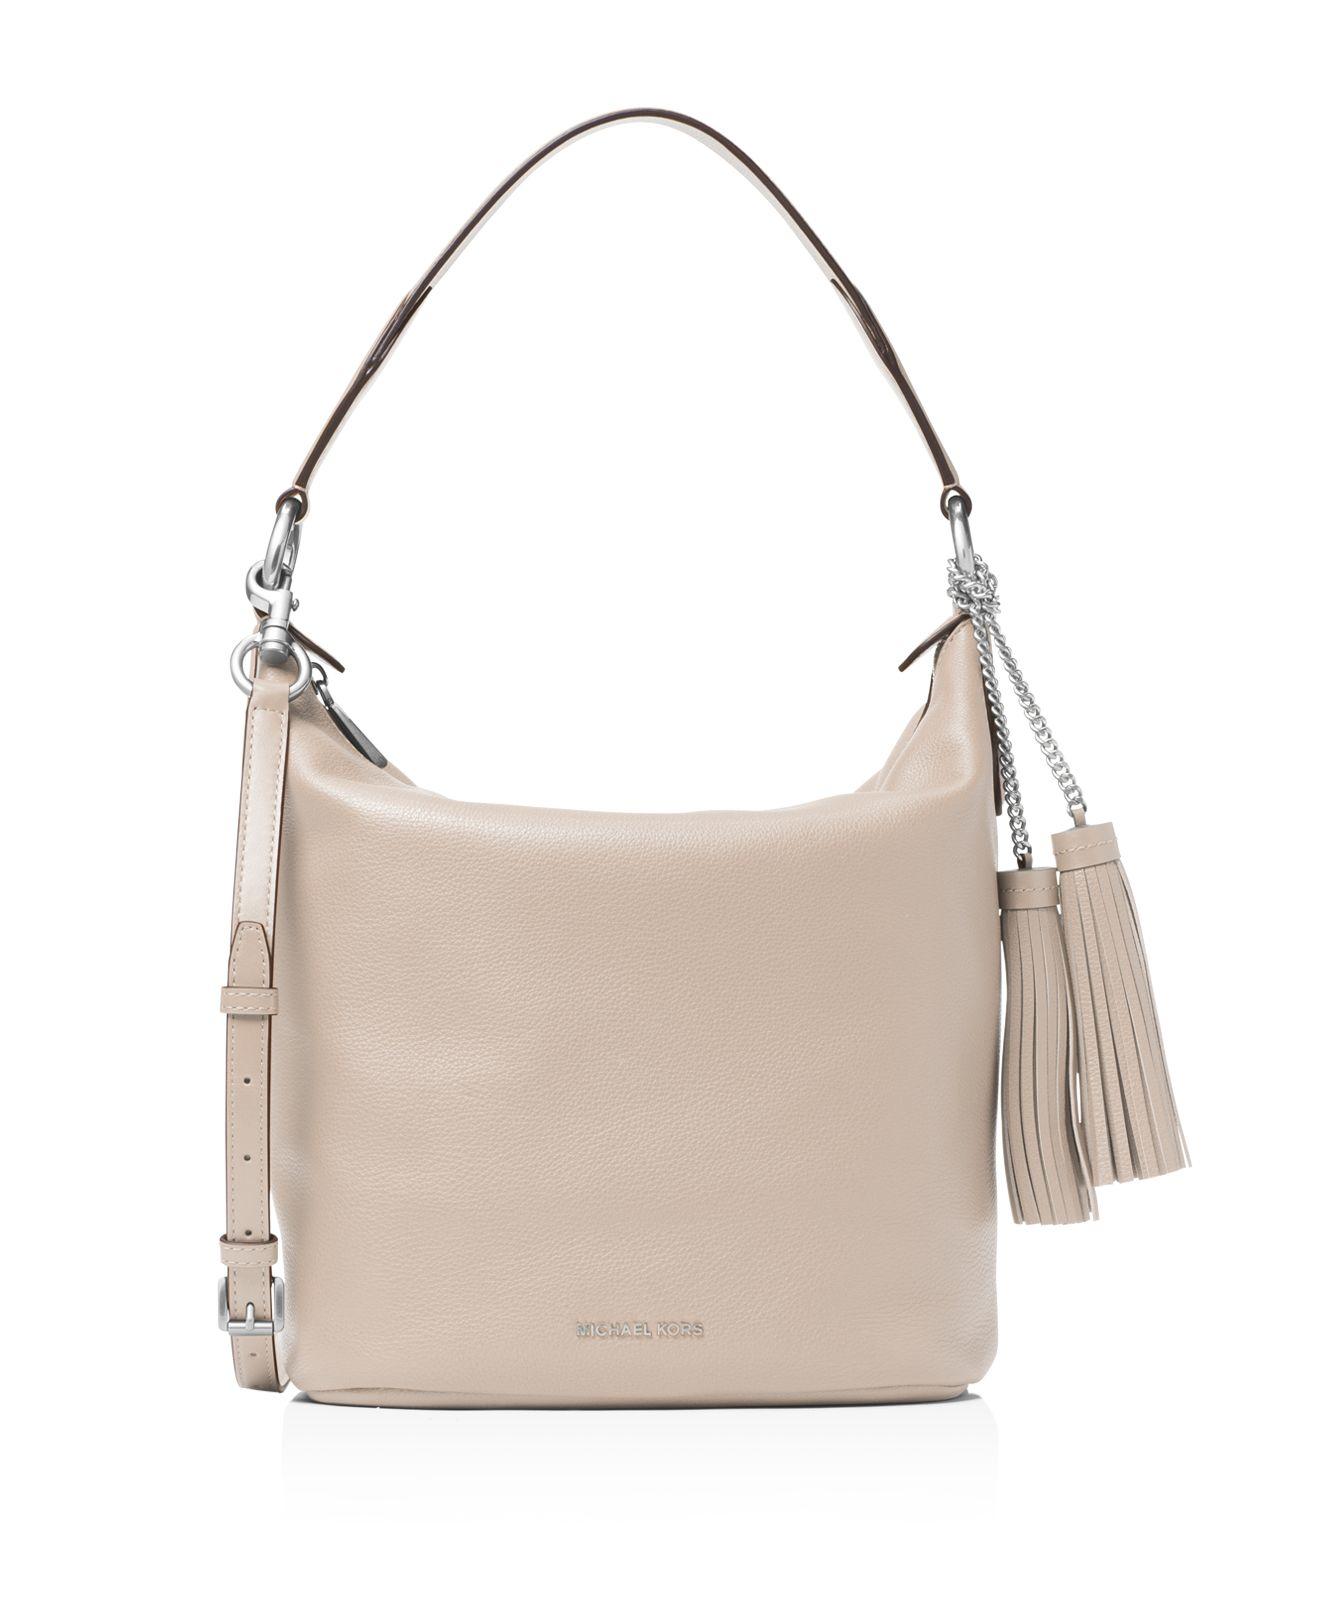 MICHAEL Michael Kors Lupita Medium Leather Messenger Bag in Black - Lyst 0a230119d3